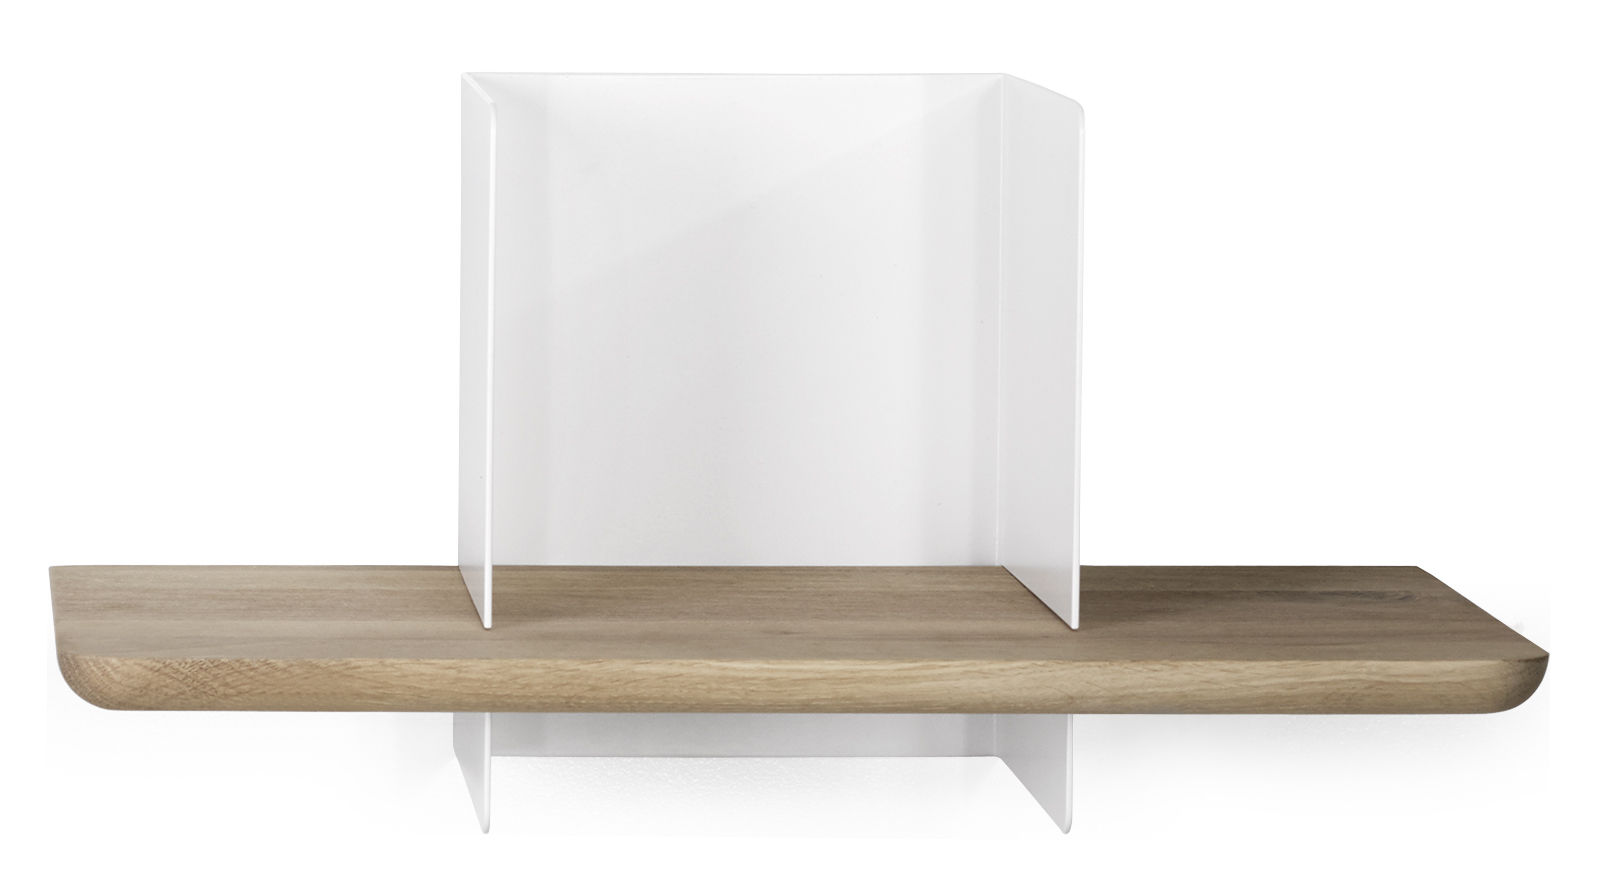 etag re clip small l 50 cm ch ne naturel blanc universo positivo. Black Bedroom Furniture Sets. Home Design Ideas